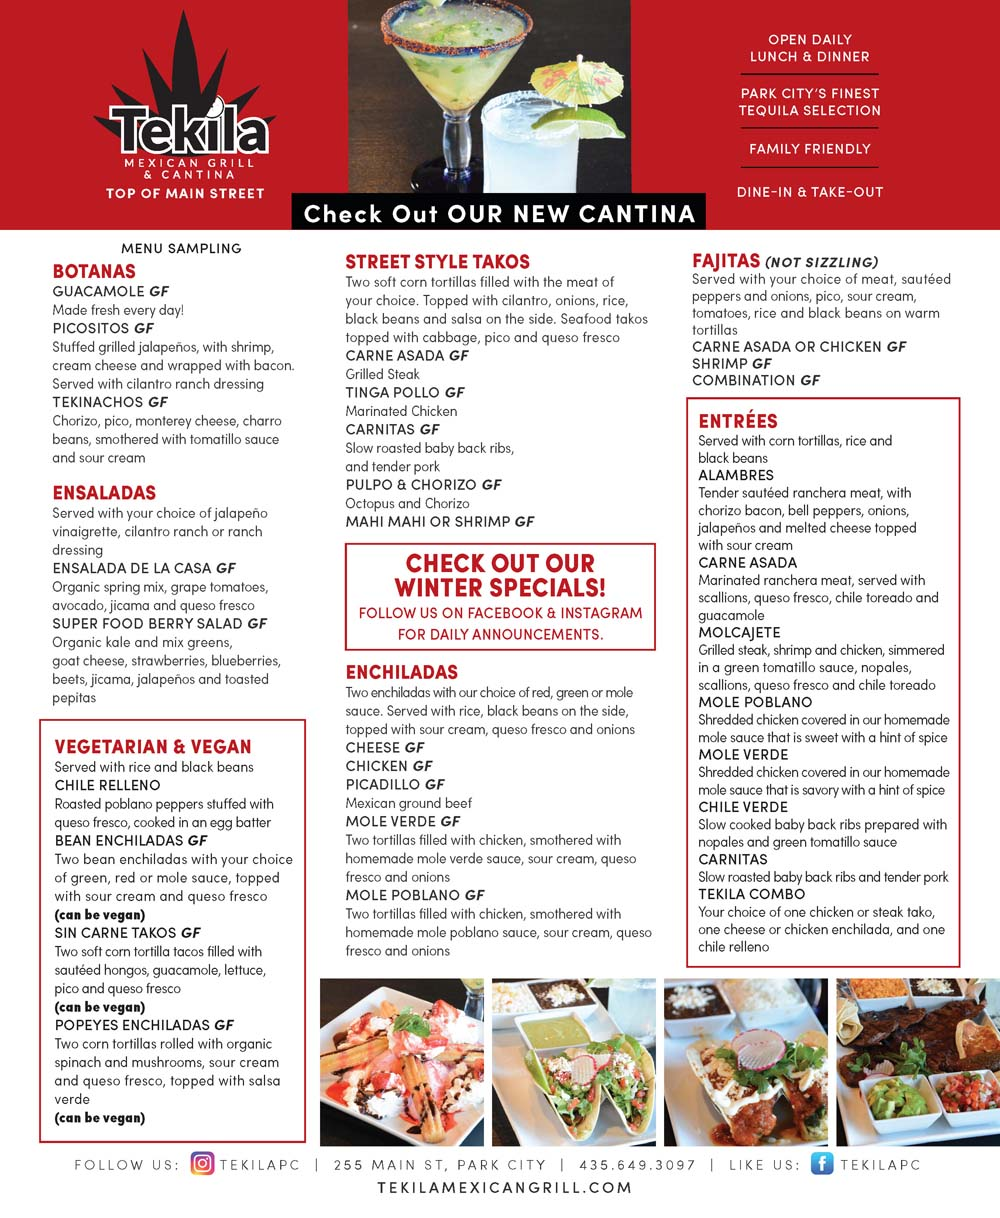 Tekila Mexican Grill and Cantina – Main Street